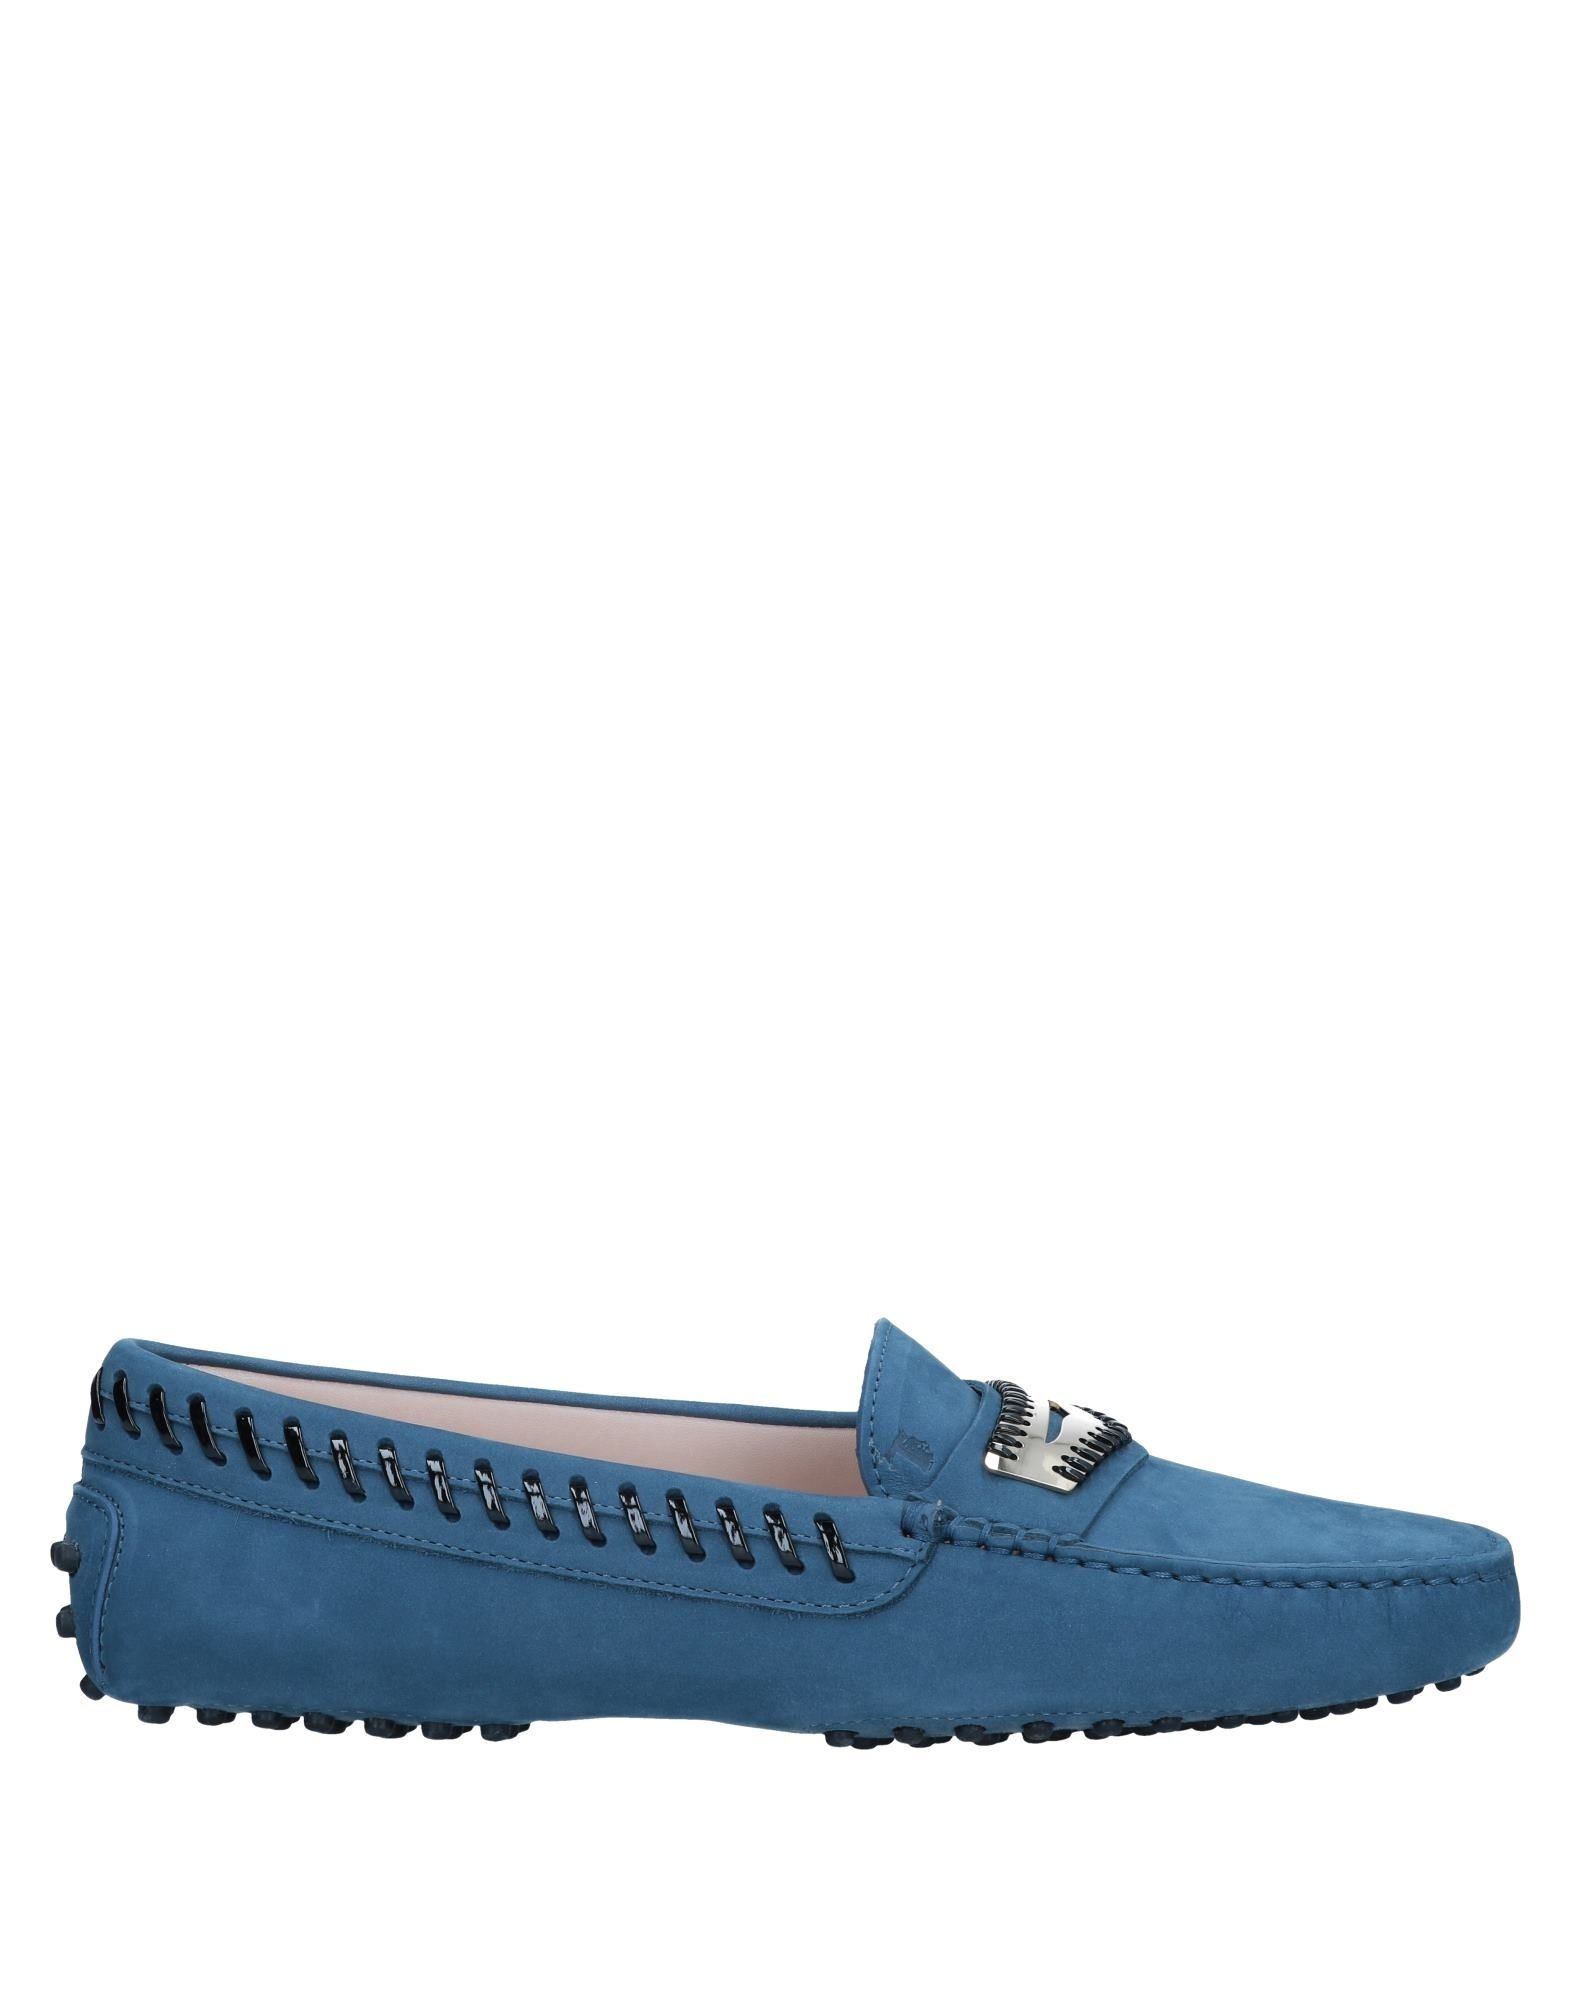 Tod's Mokassins Damen  11229637LXGünstige gut aussehende Schuhe